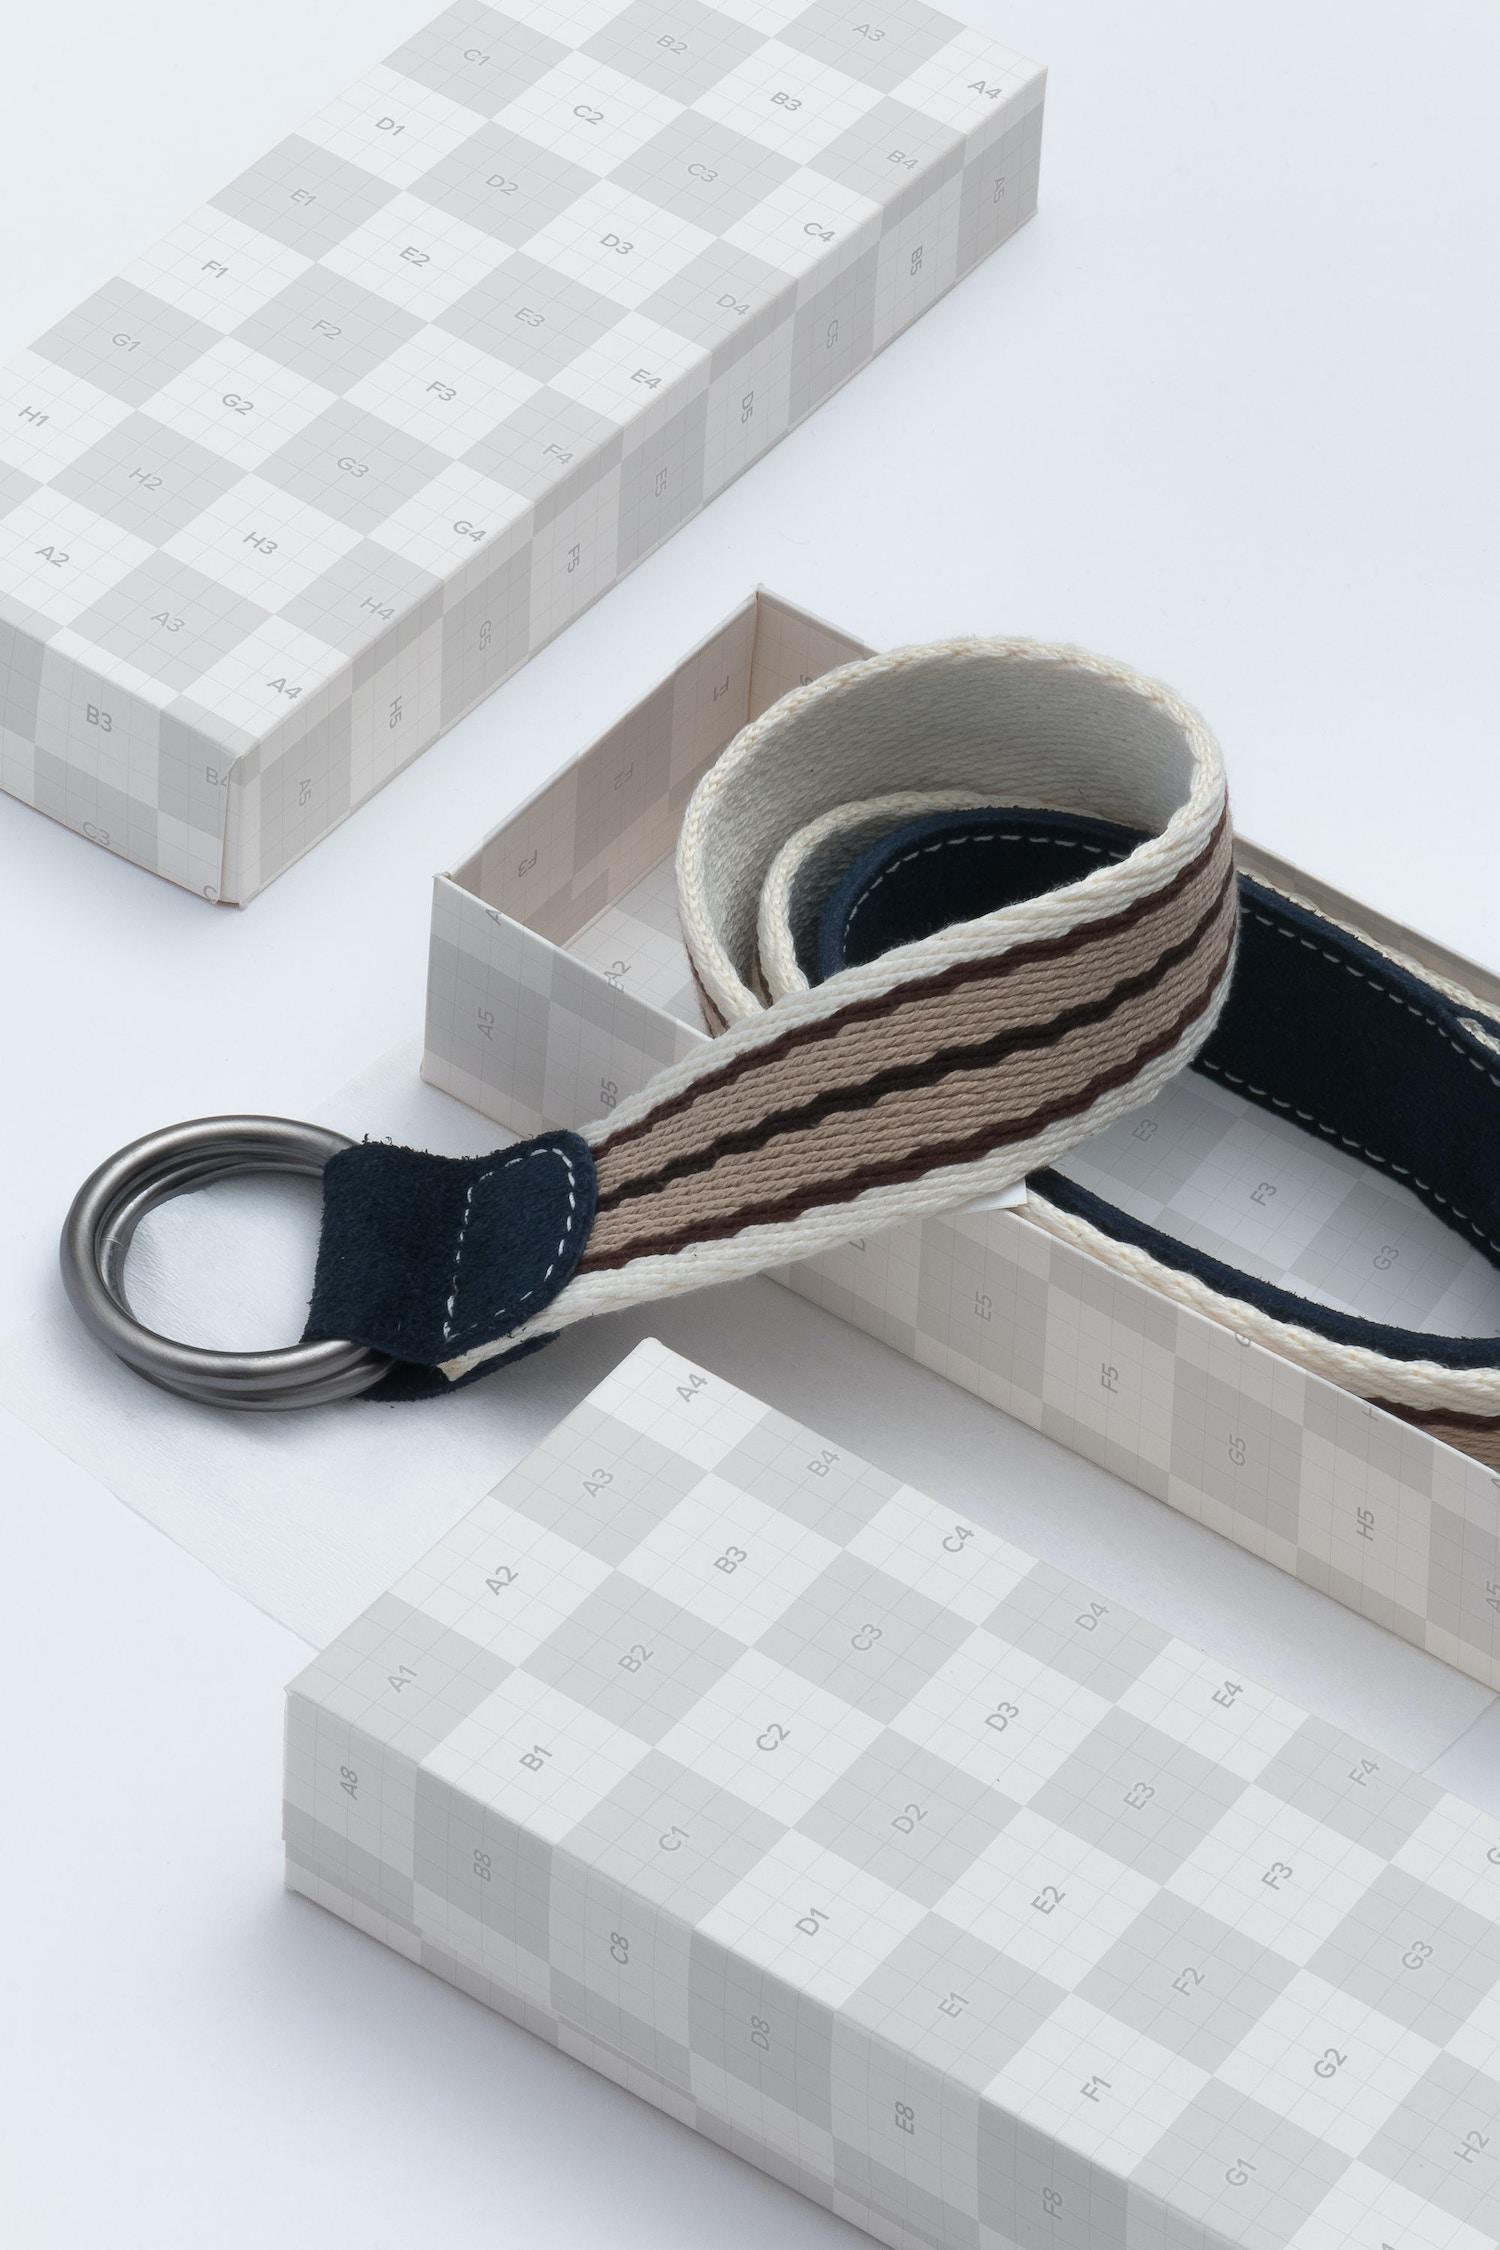 Rectangular Gift Box Mockup 01 by Ktyellow  on Original Mockups